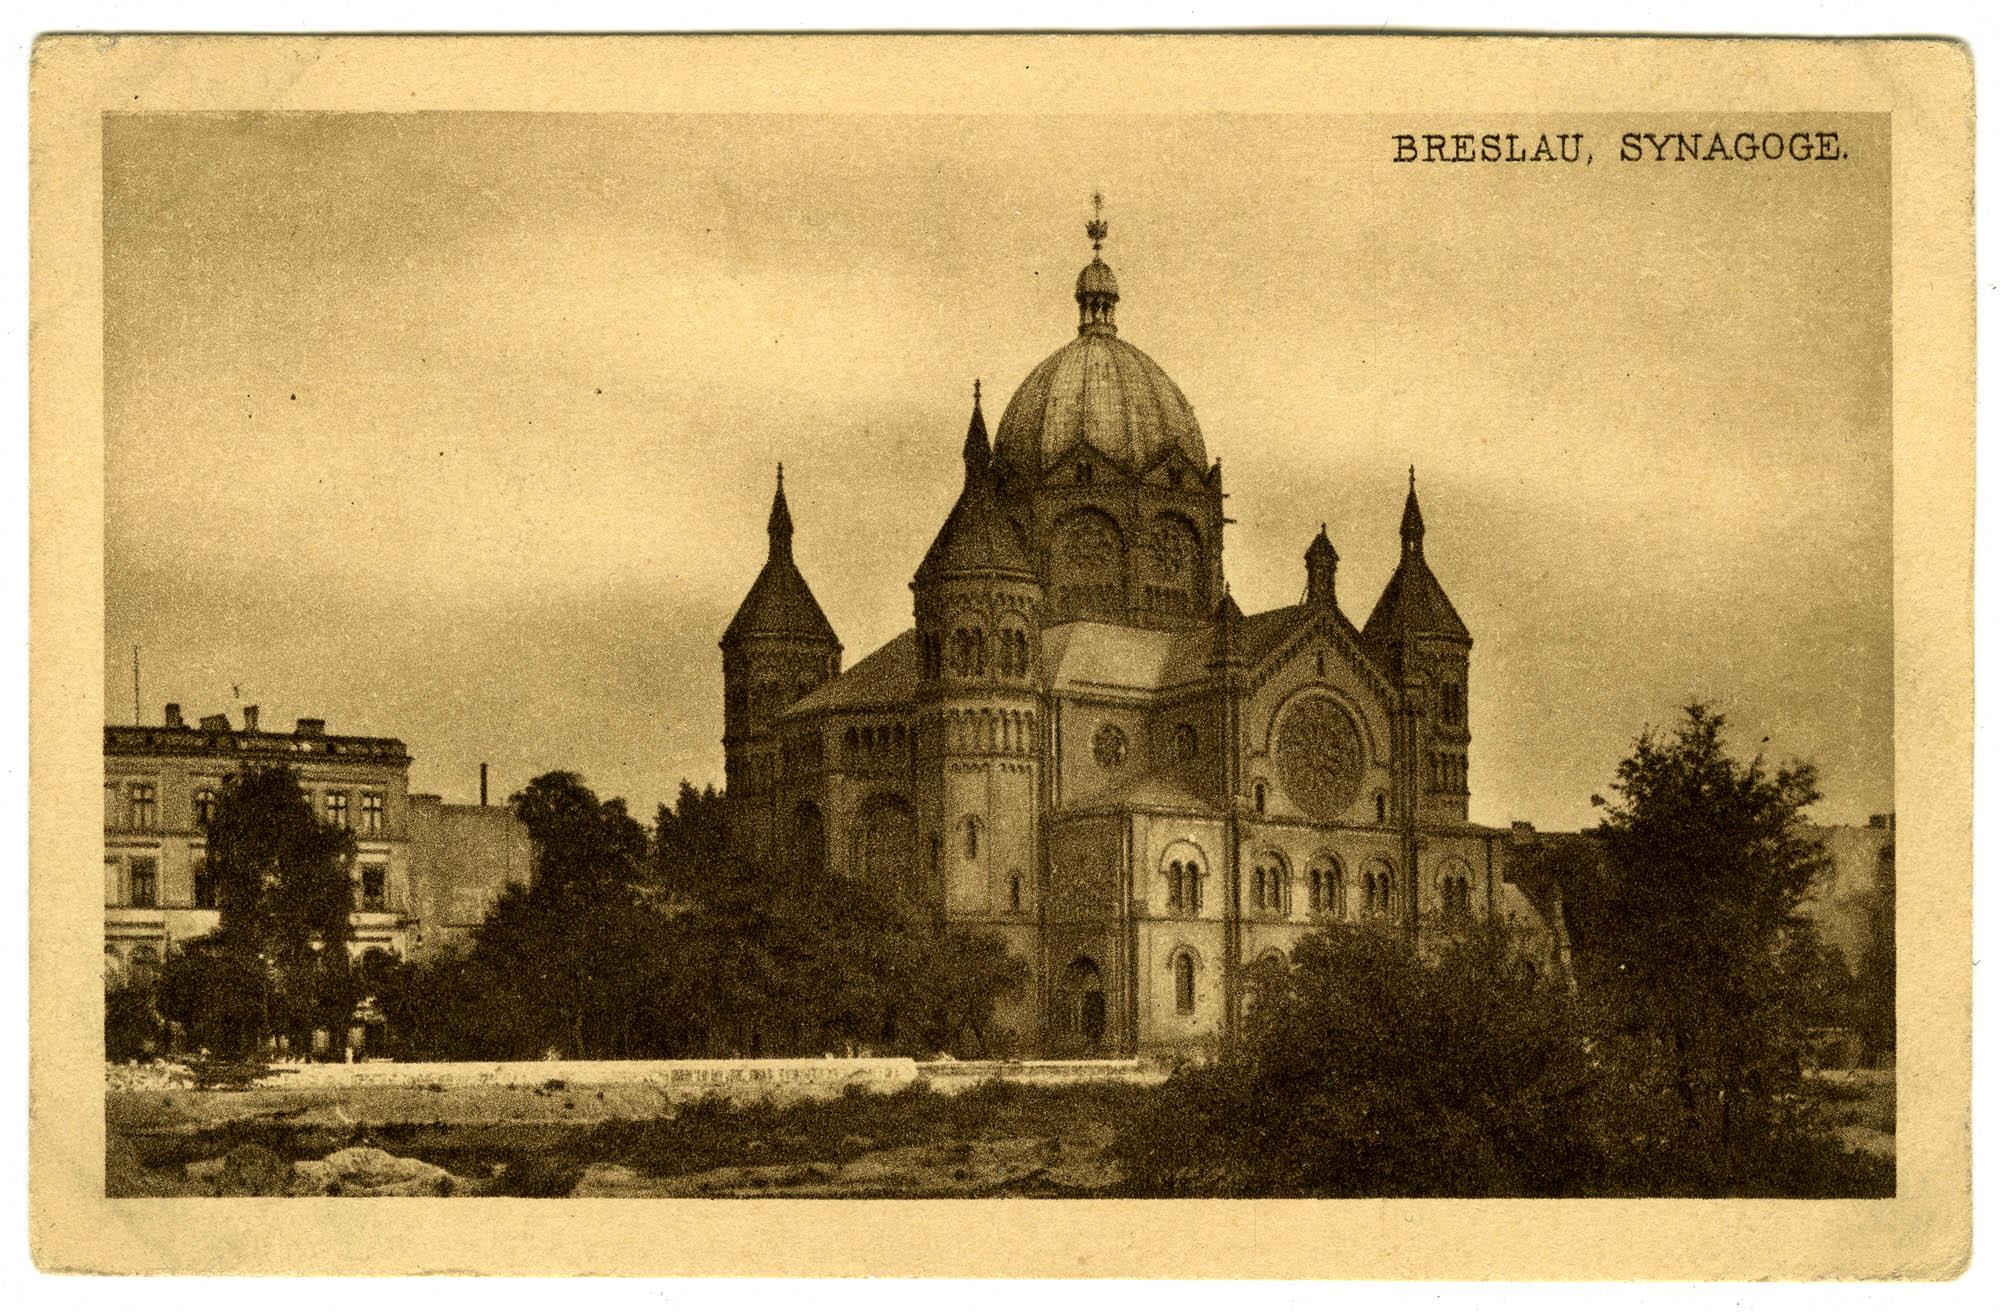 Breslau, Synagoge.